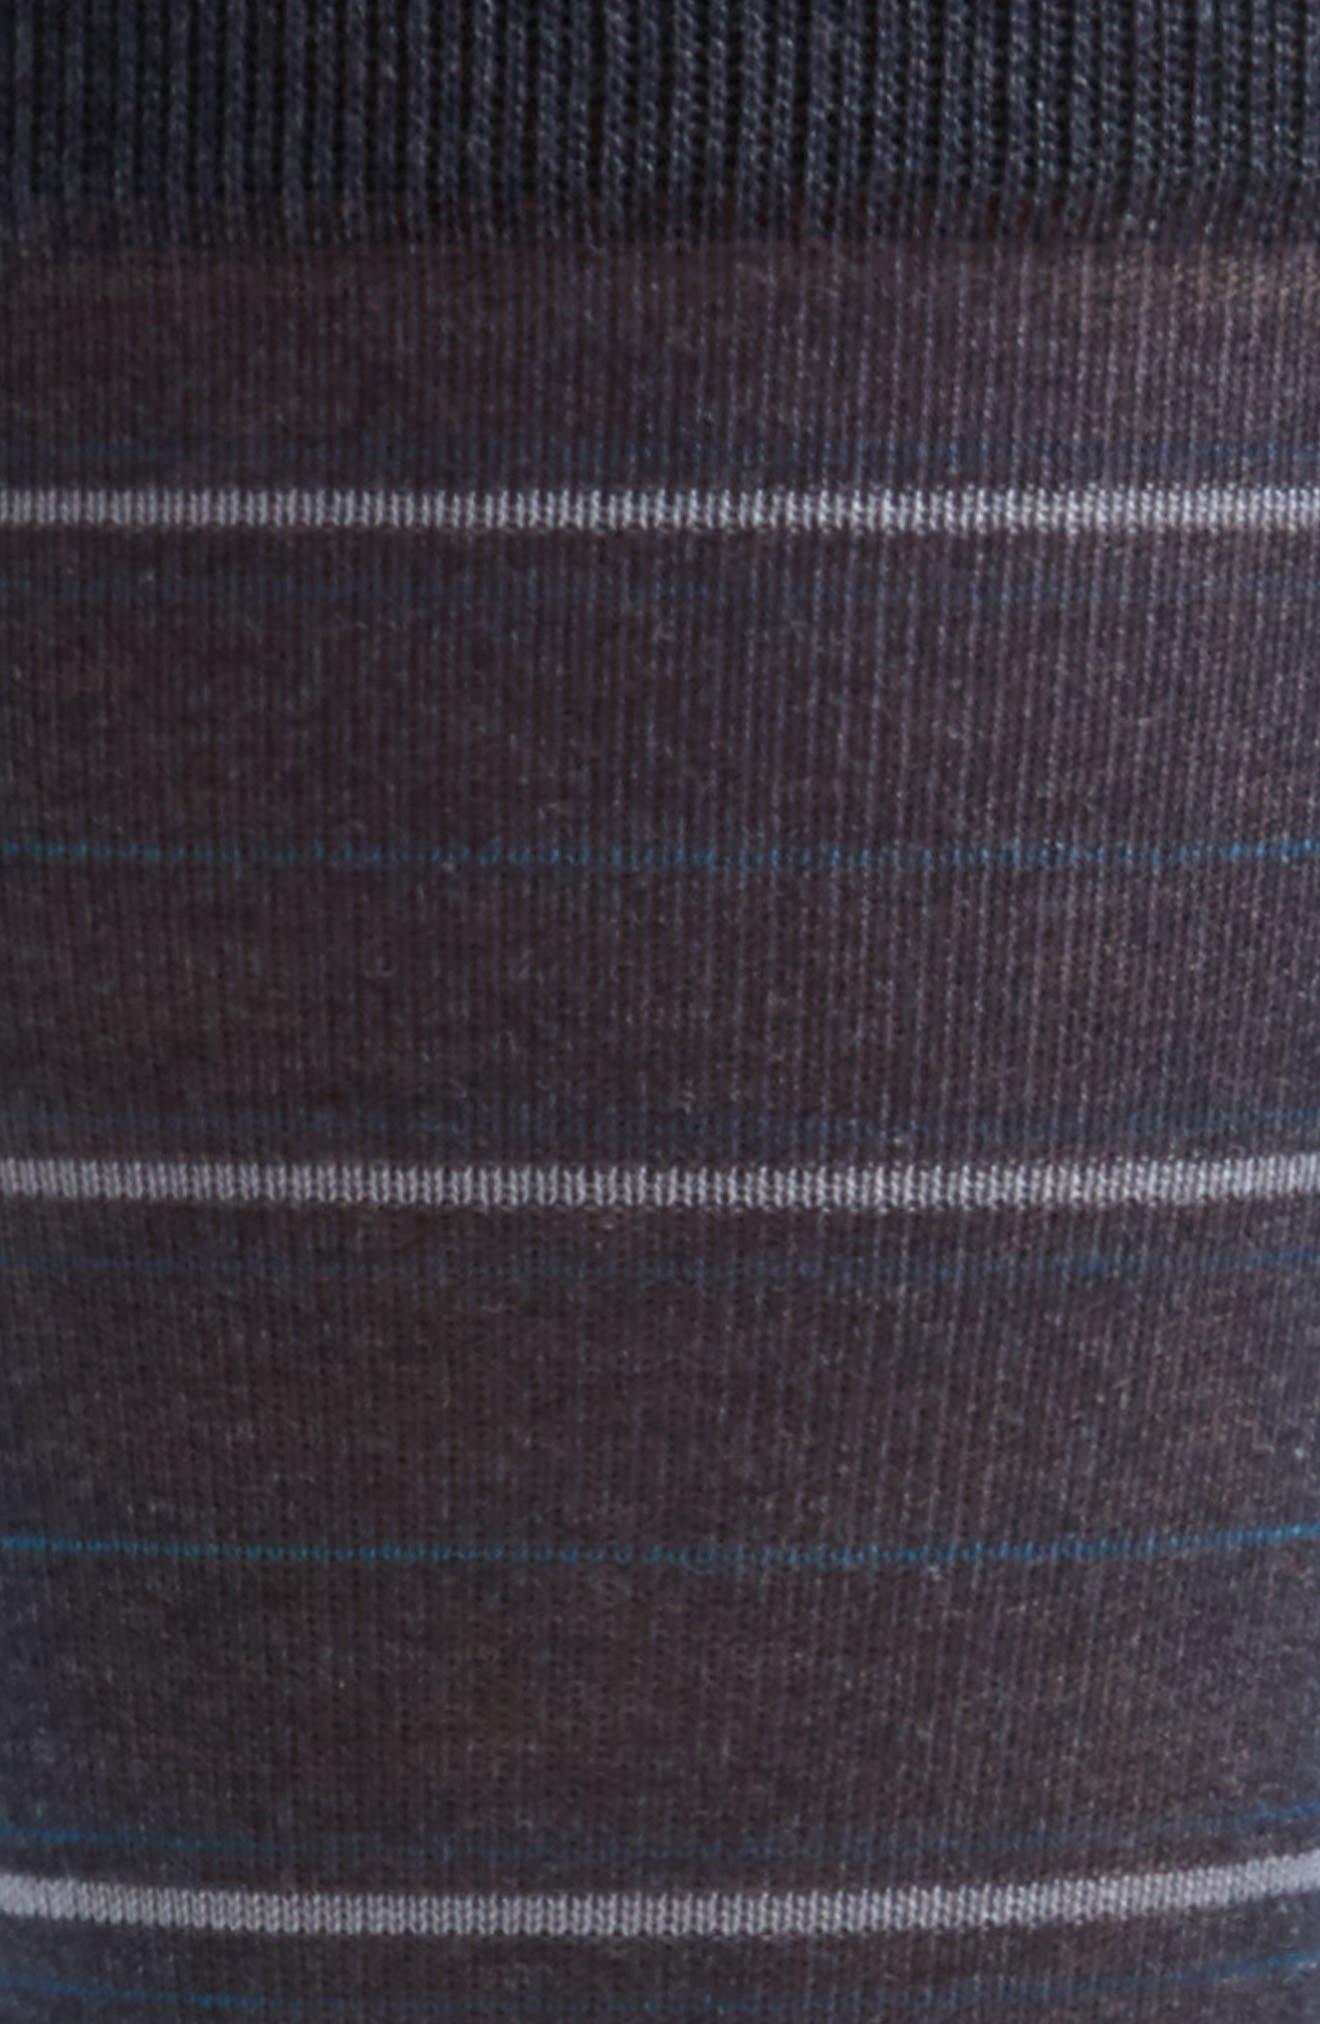 Interlines Socks,                             Alternate thumbnail 2, color,                             Blue Denim